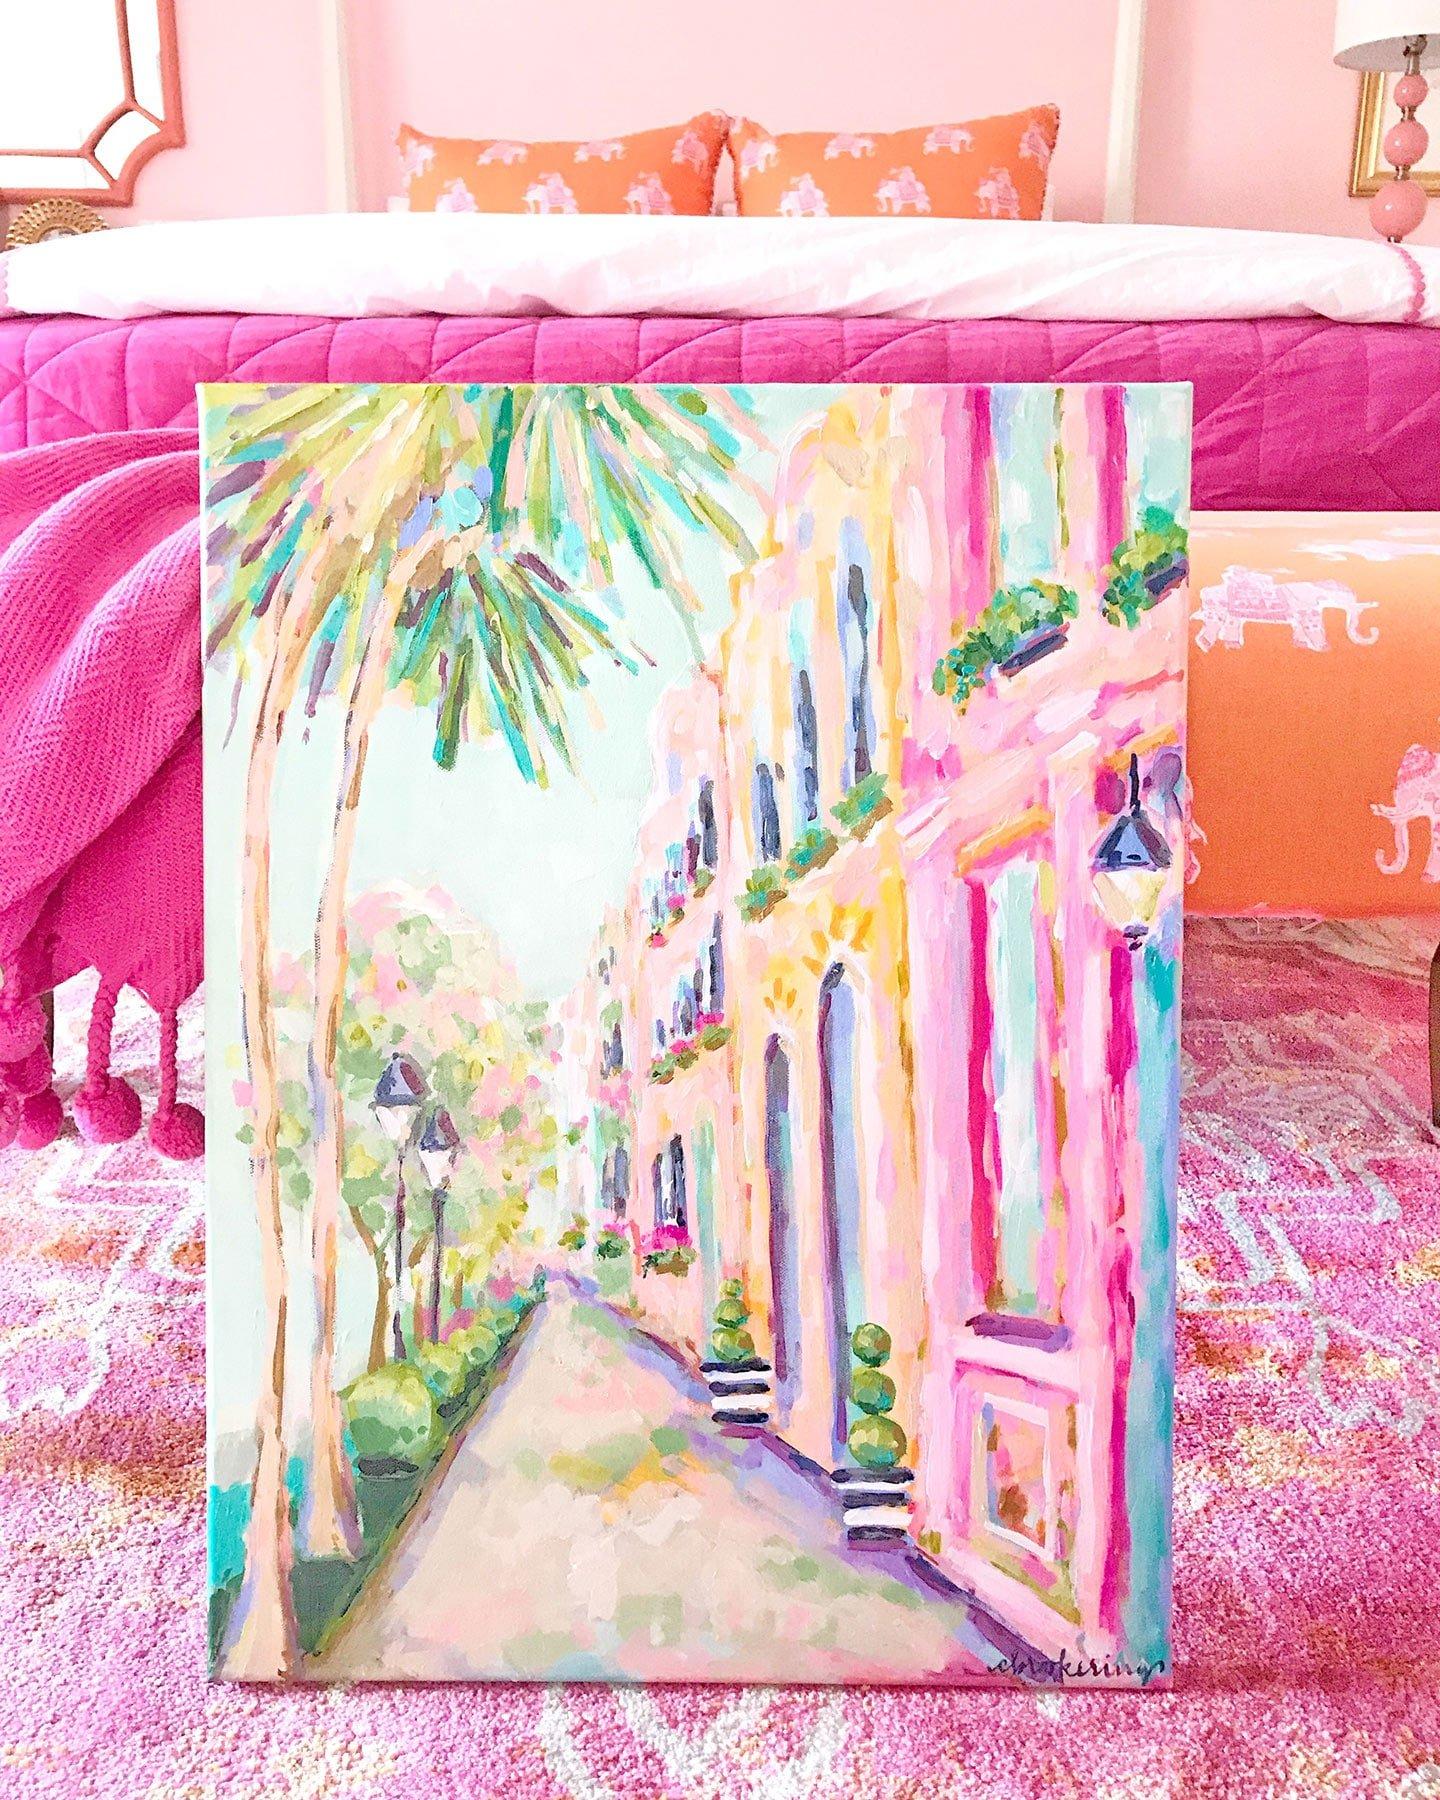 Pink and Orange Girl's Bedroom #bedroom #homedecor